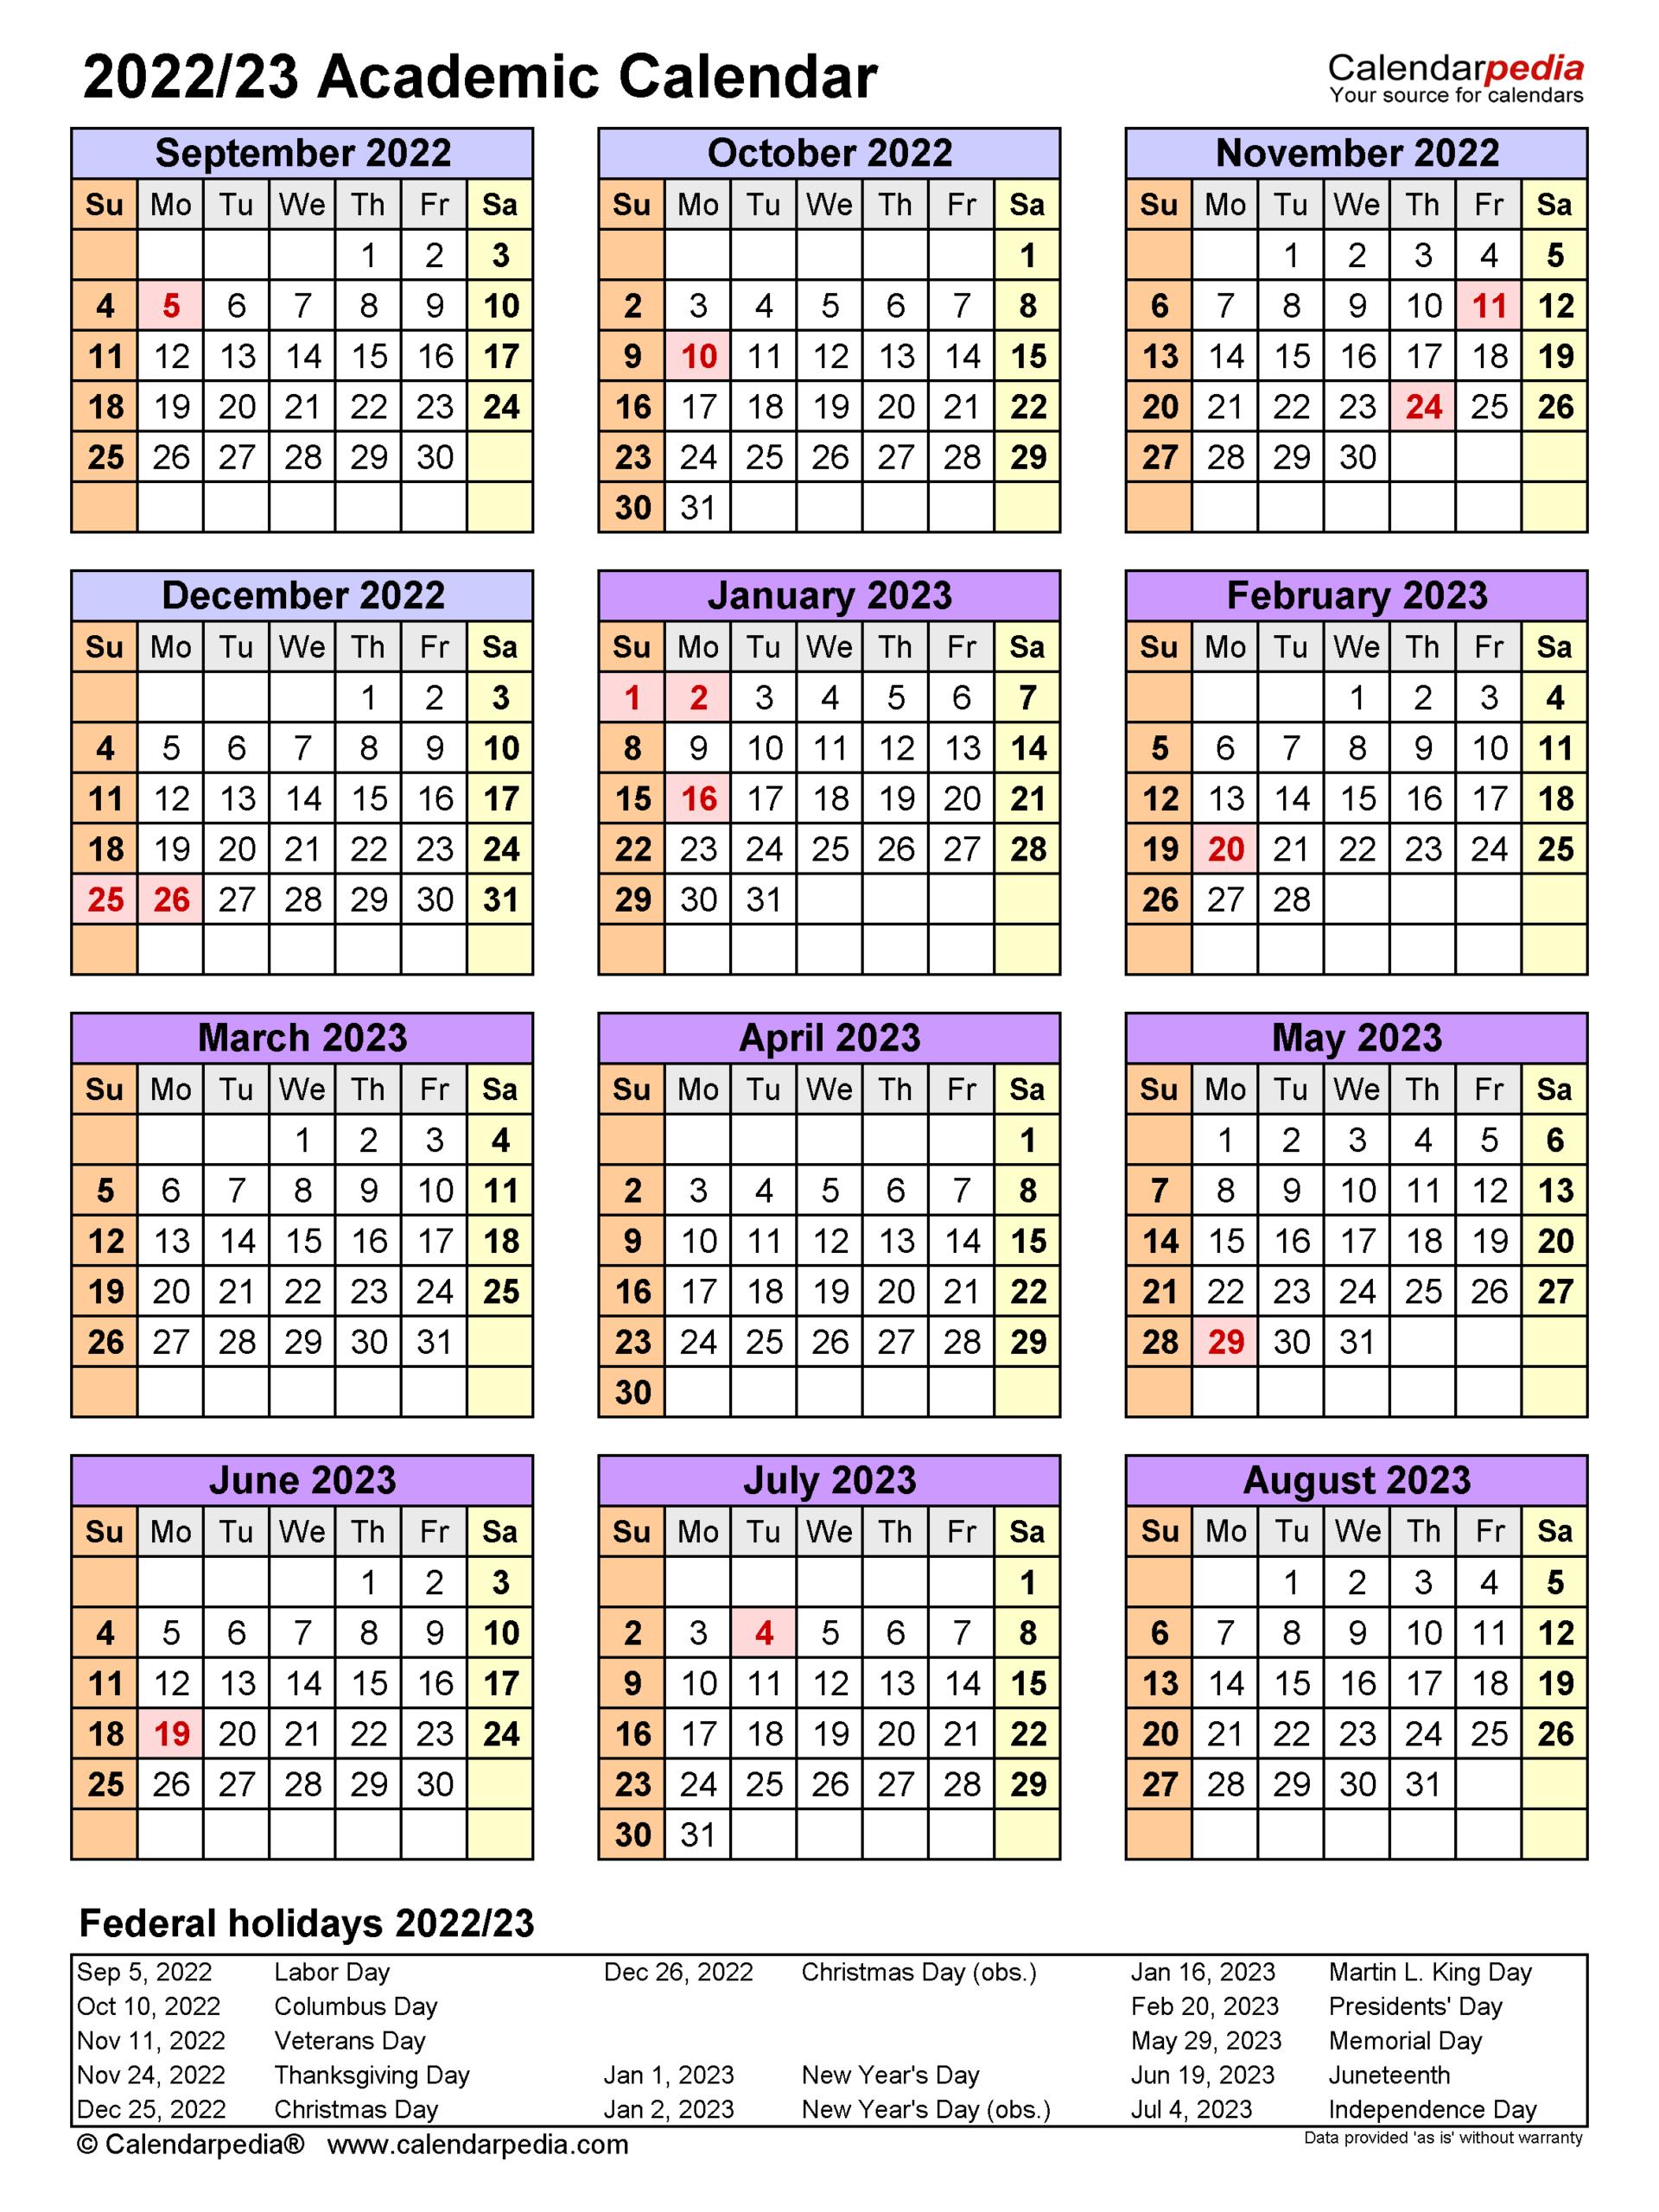 Academic Calendars 2022/2023 - Free Printable Word Templates